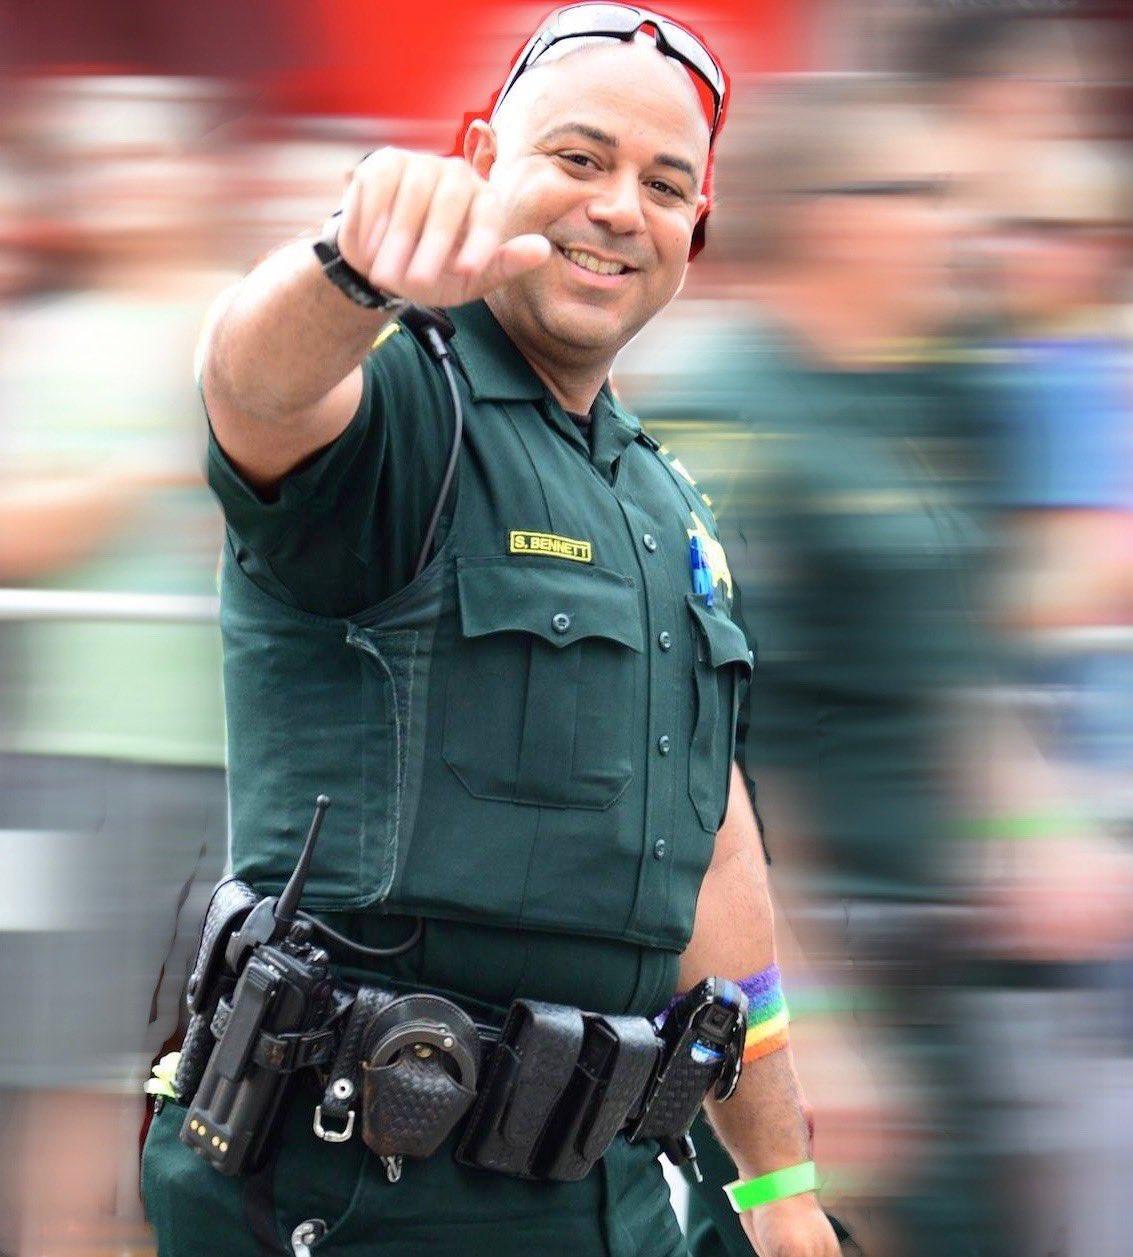 Deputy Sheriff Shannon Bennett | Broward County Sheriff's Office, Florida